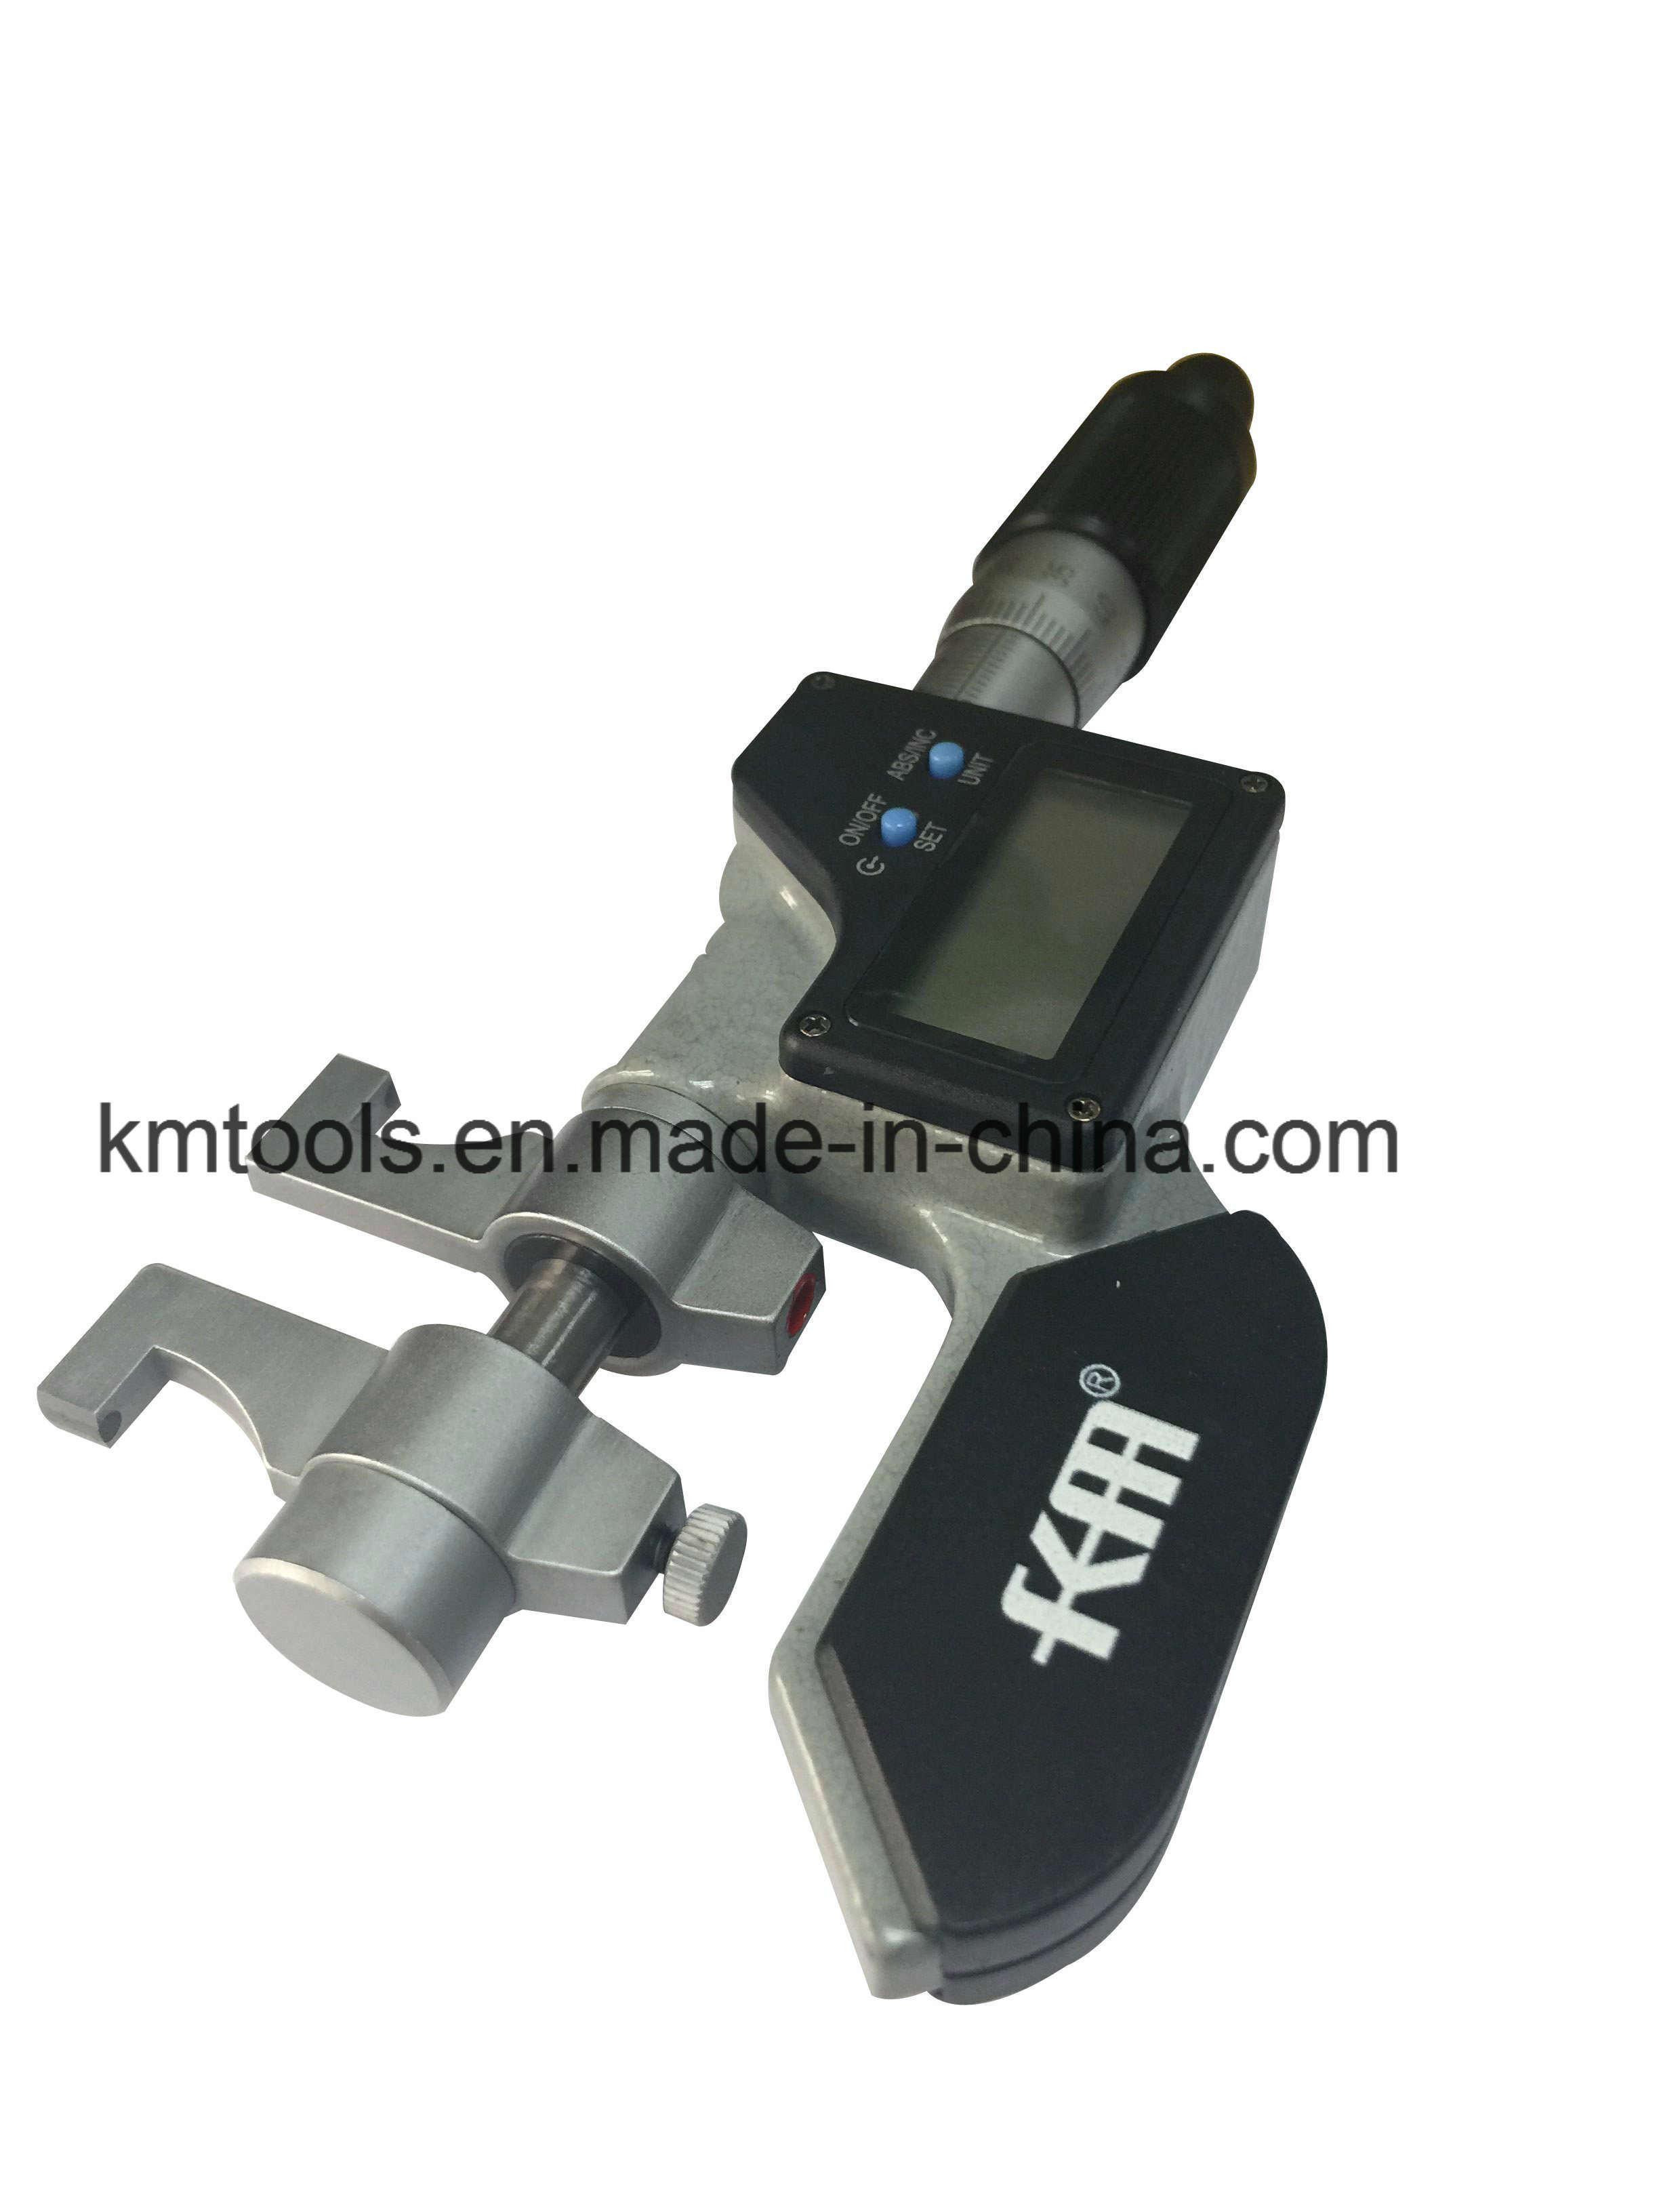 25-50mm Digital Inside Micrometers Caliper Type